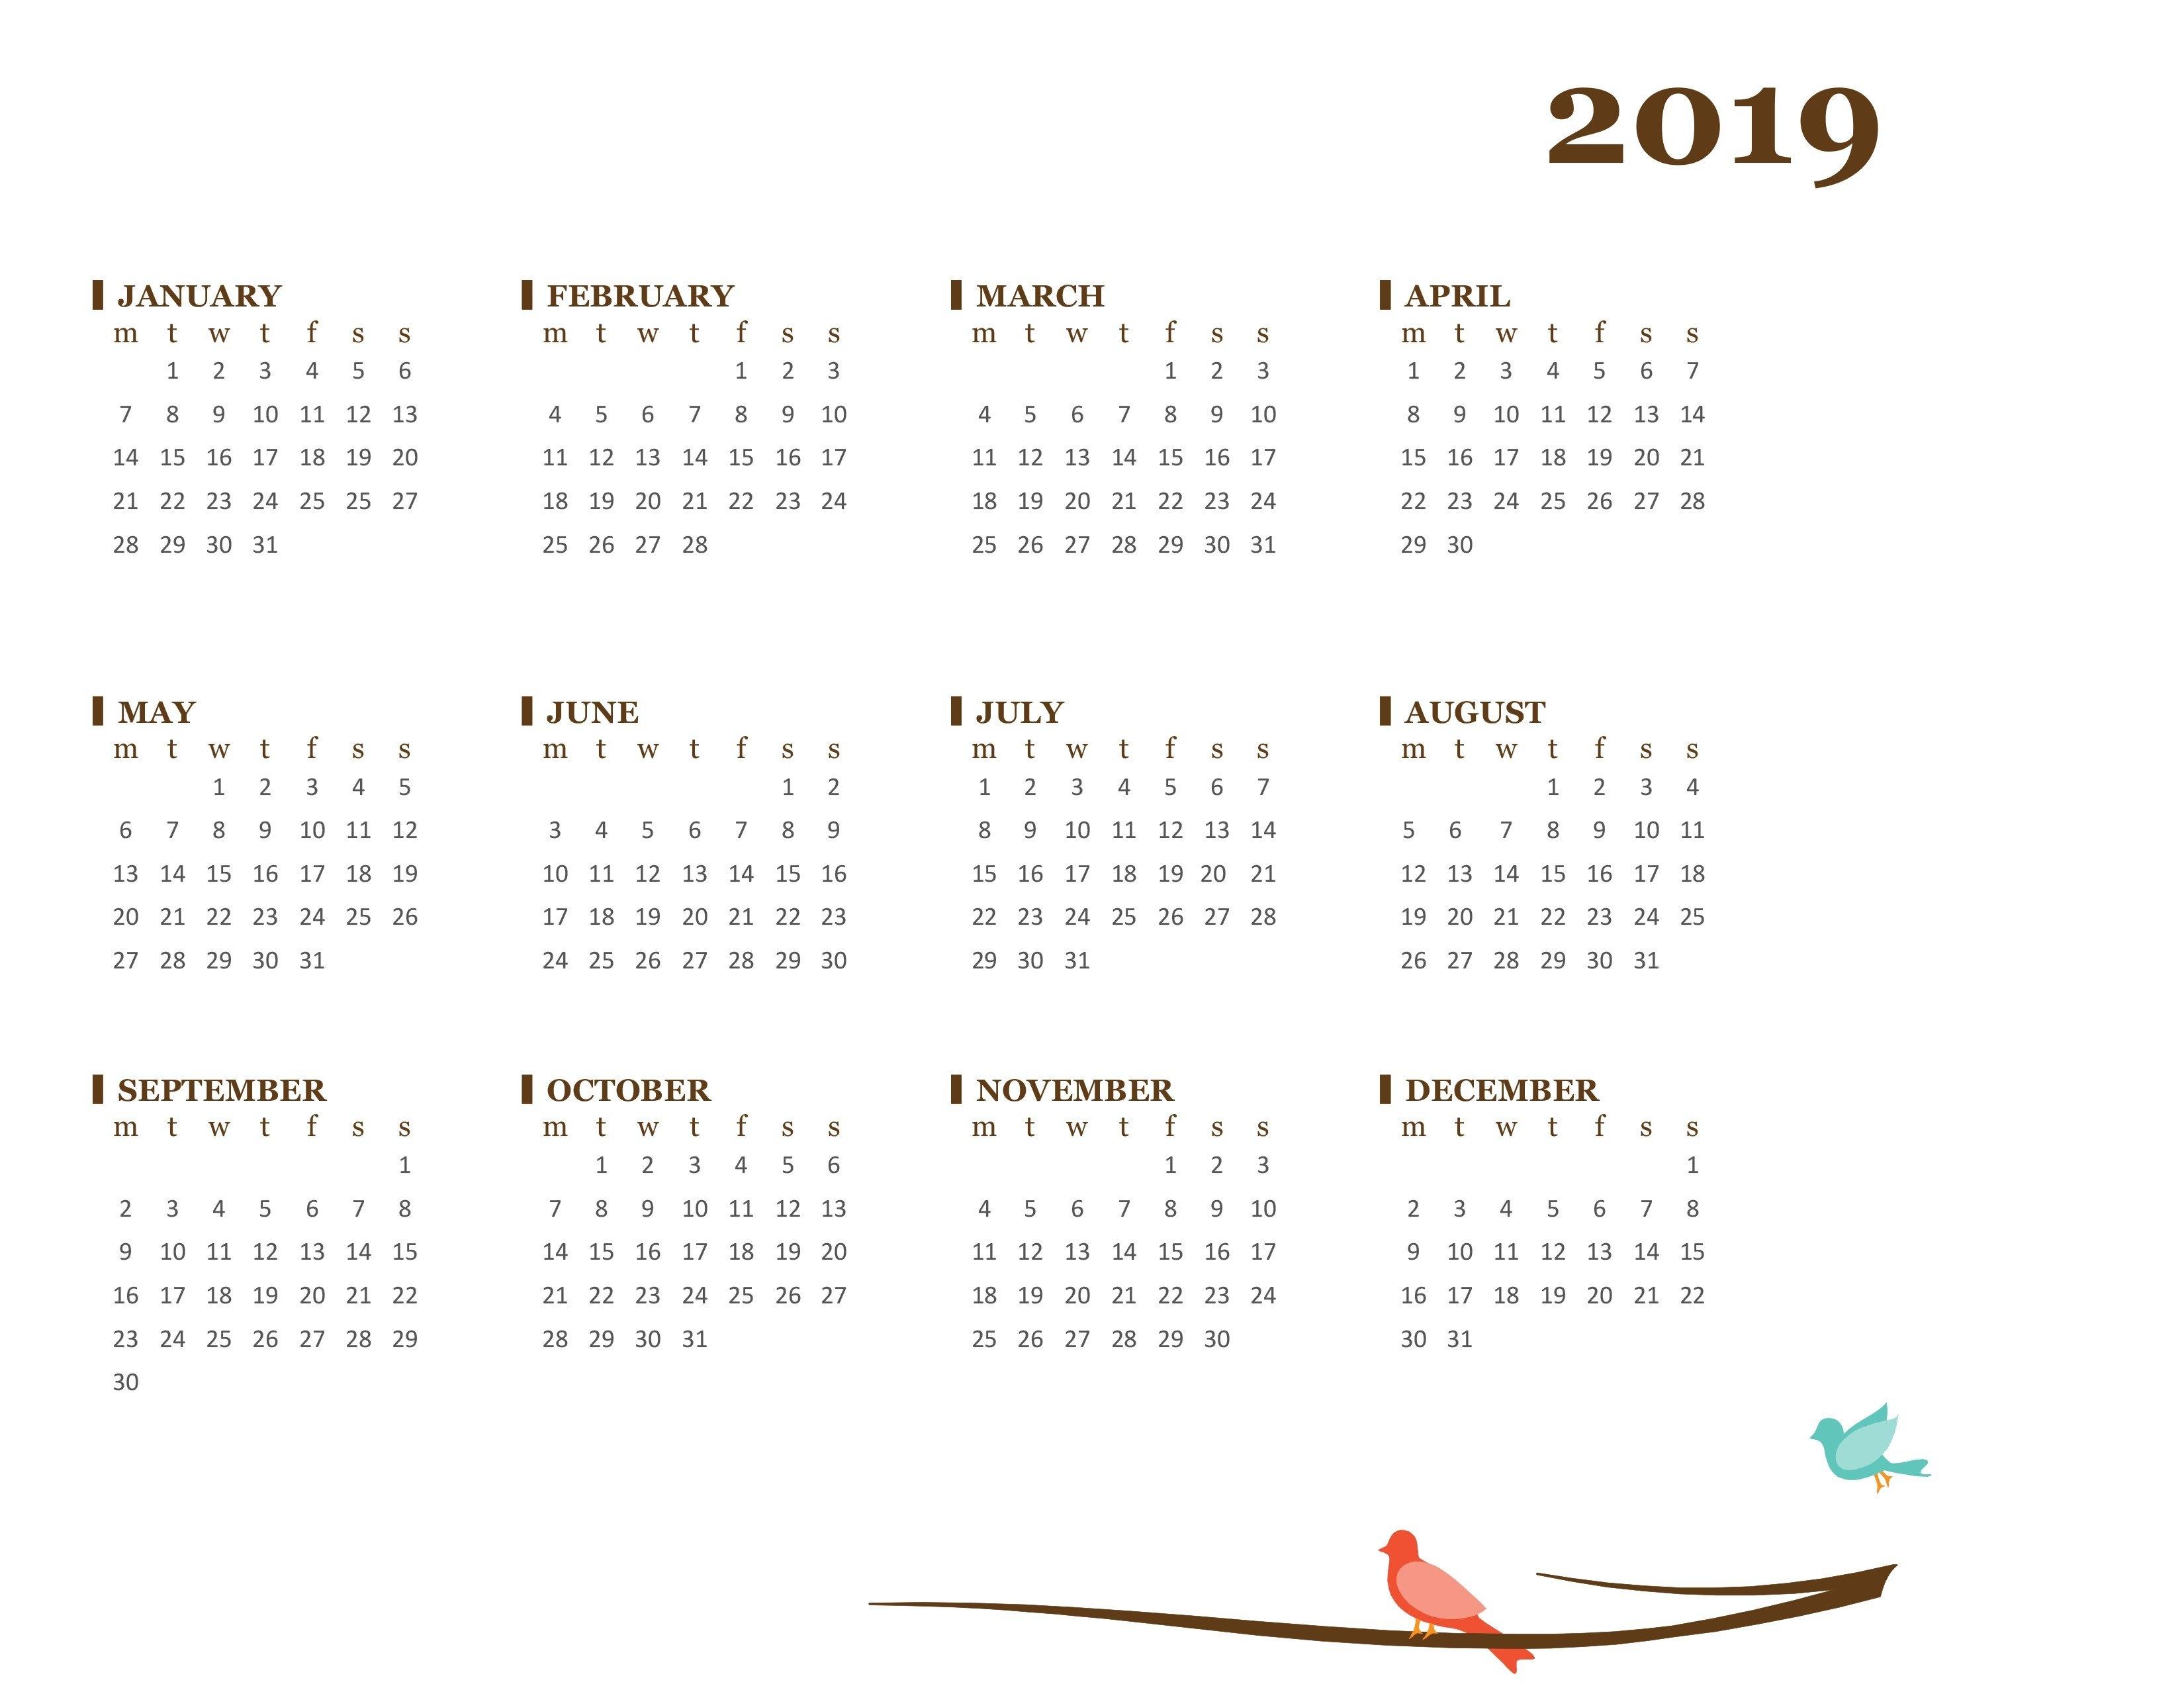 2019 Yearly Calendar (Mon-Sun) Calendar 2019 Yearly Template